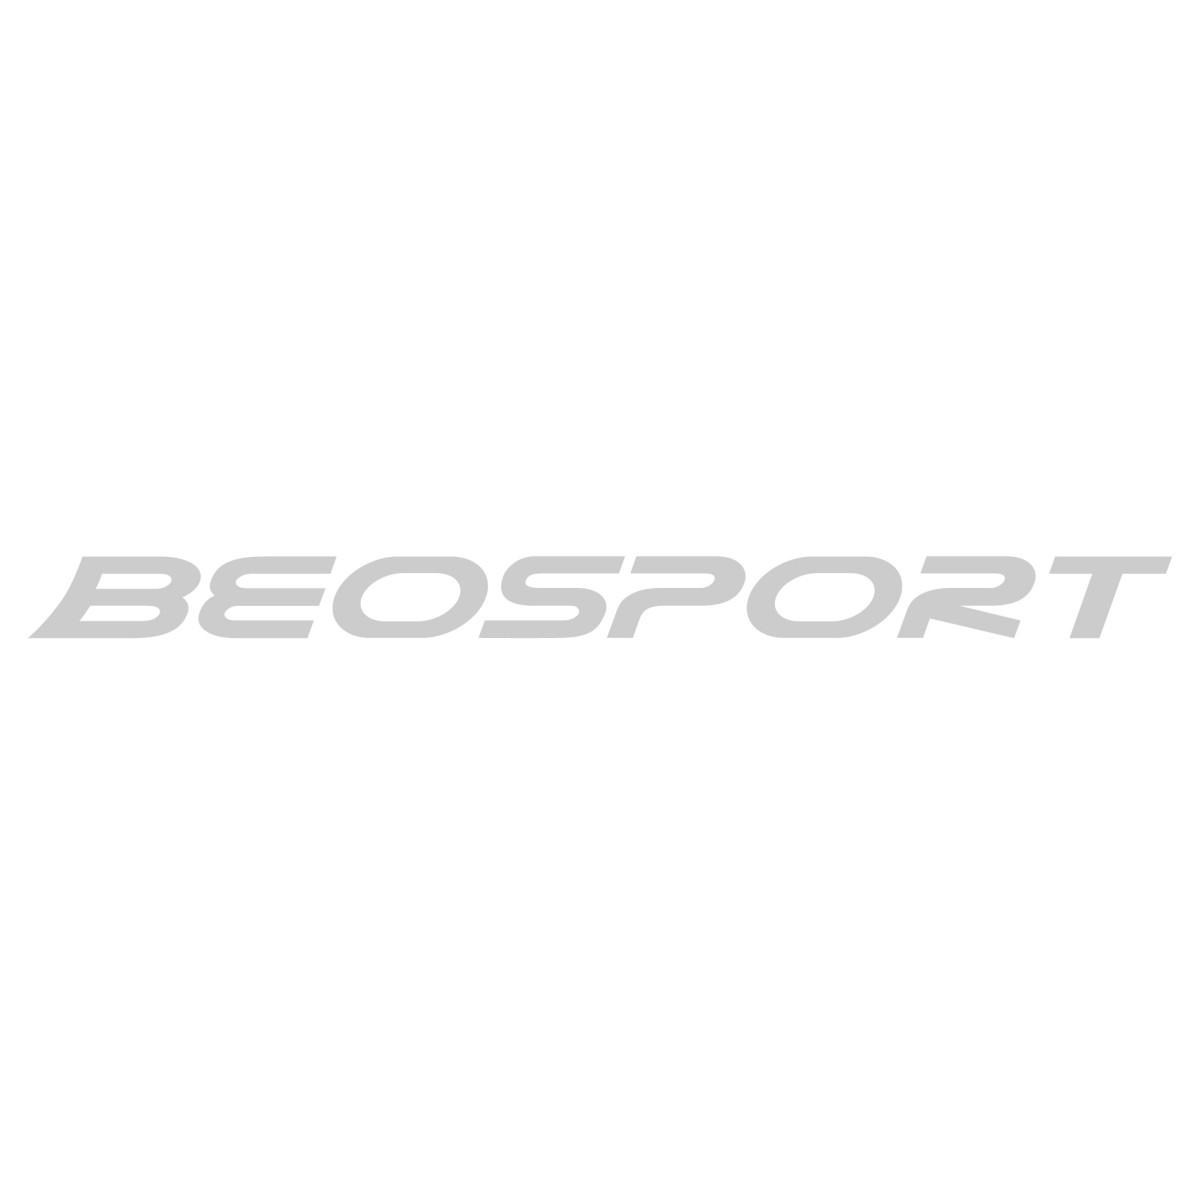 The North Face W Tnl Tee majica